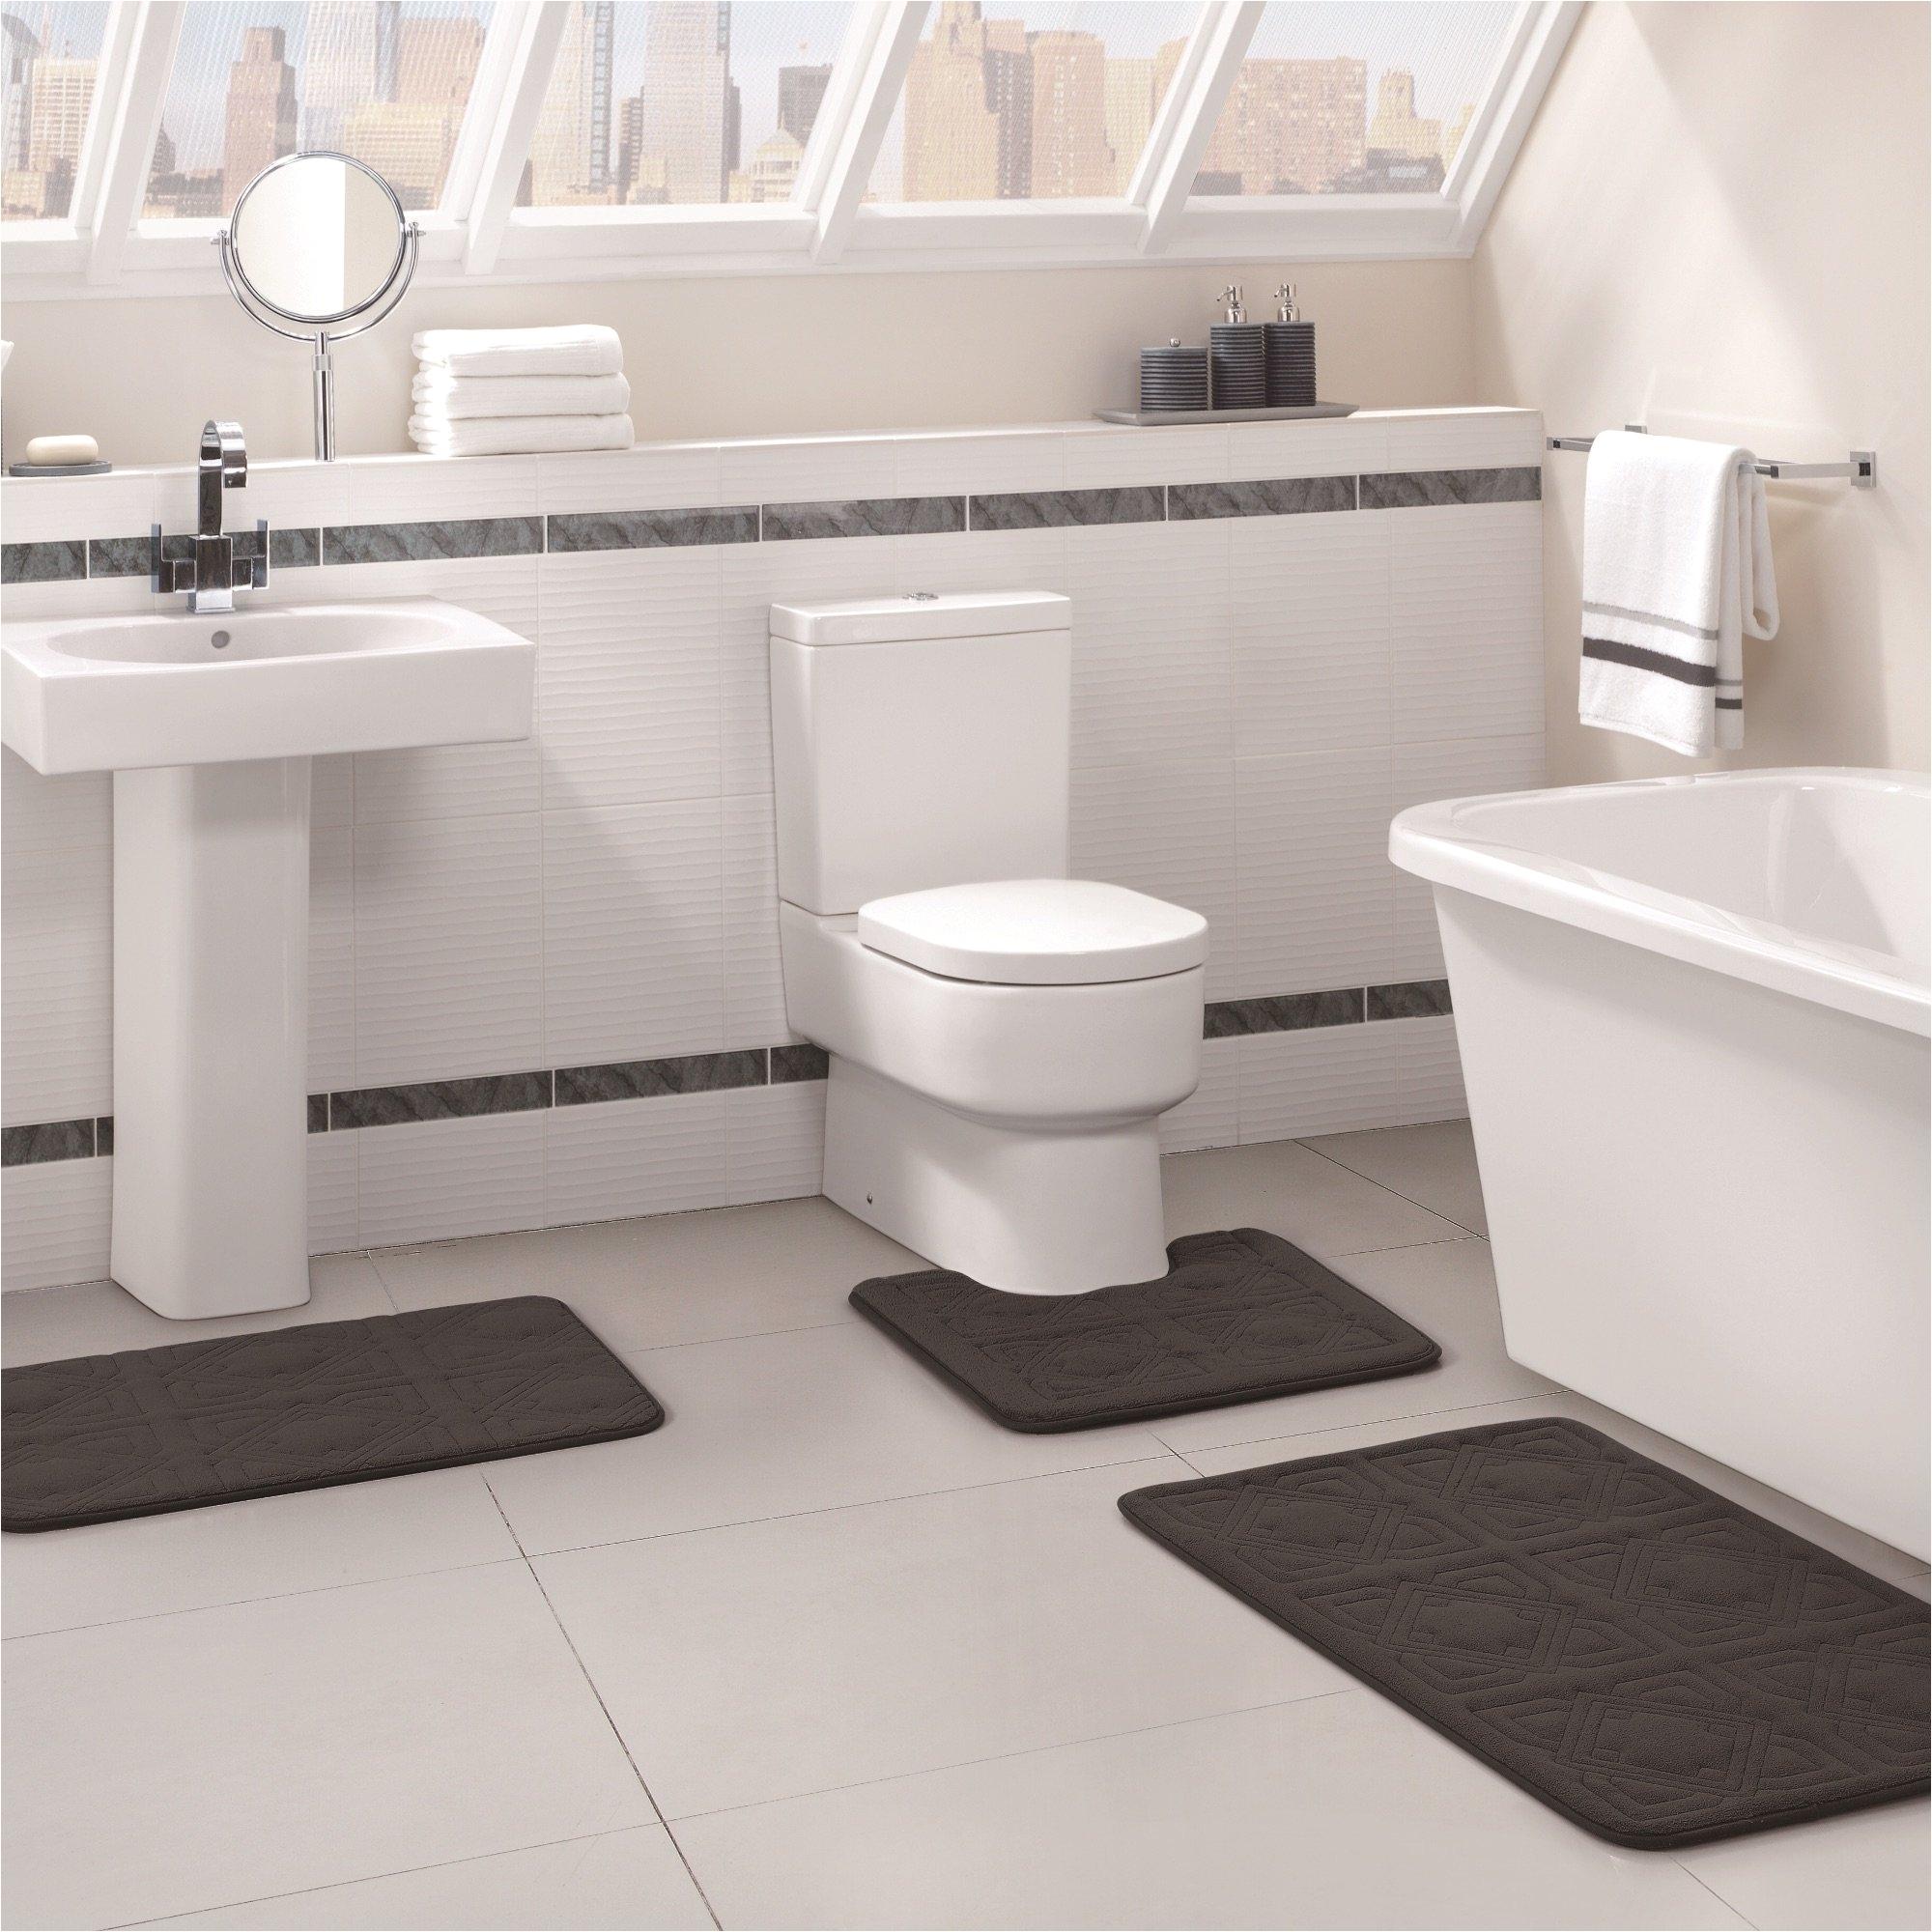 Three Piece Bath Rug Sets Shop Bathroom Accessories for Any Budget Vcny Home